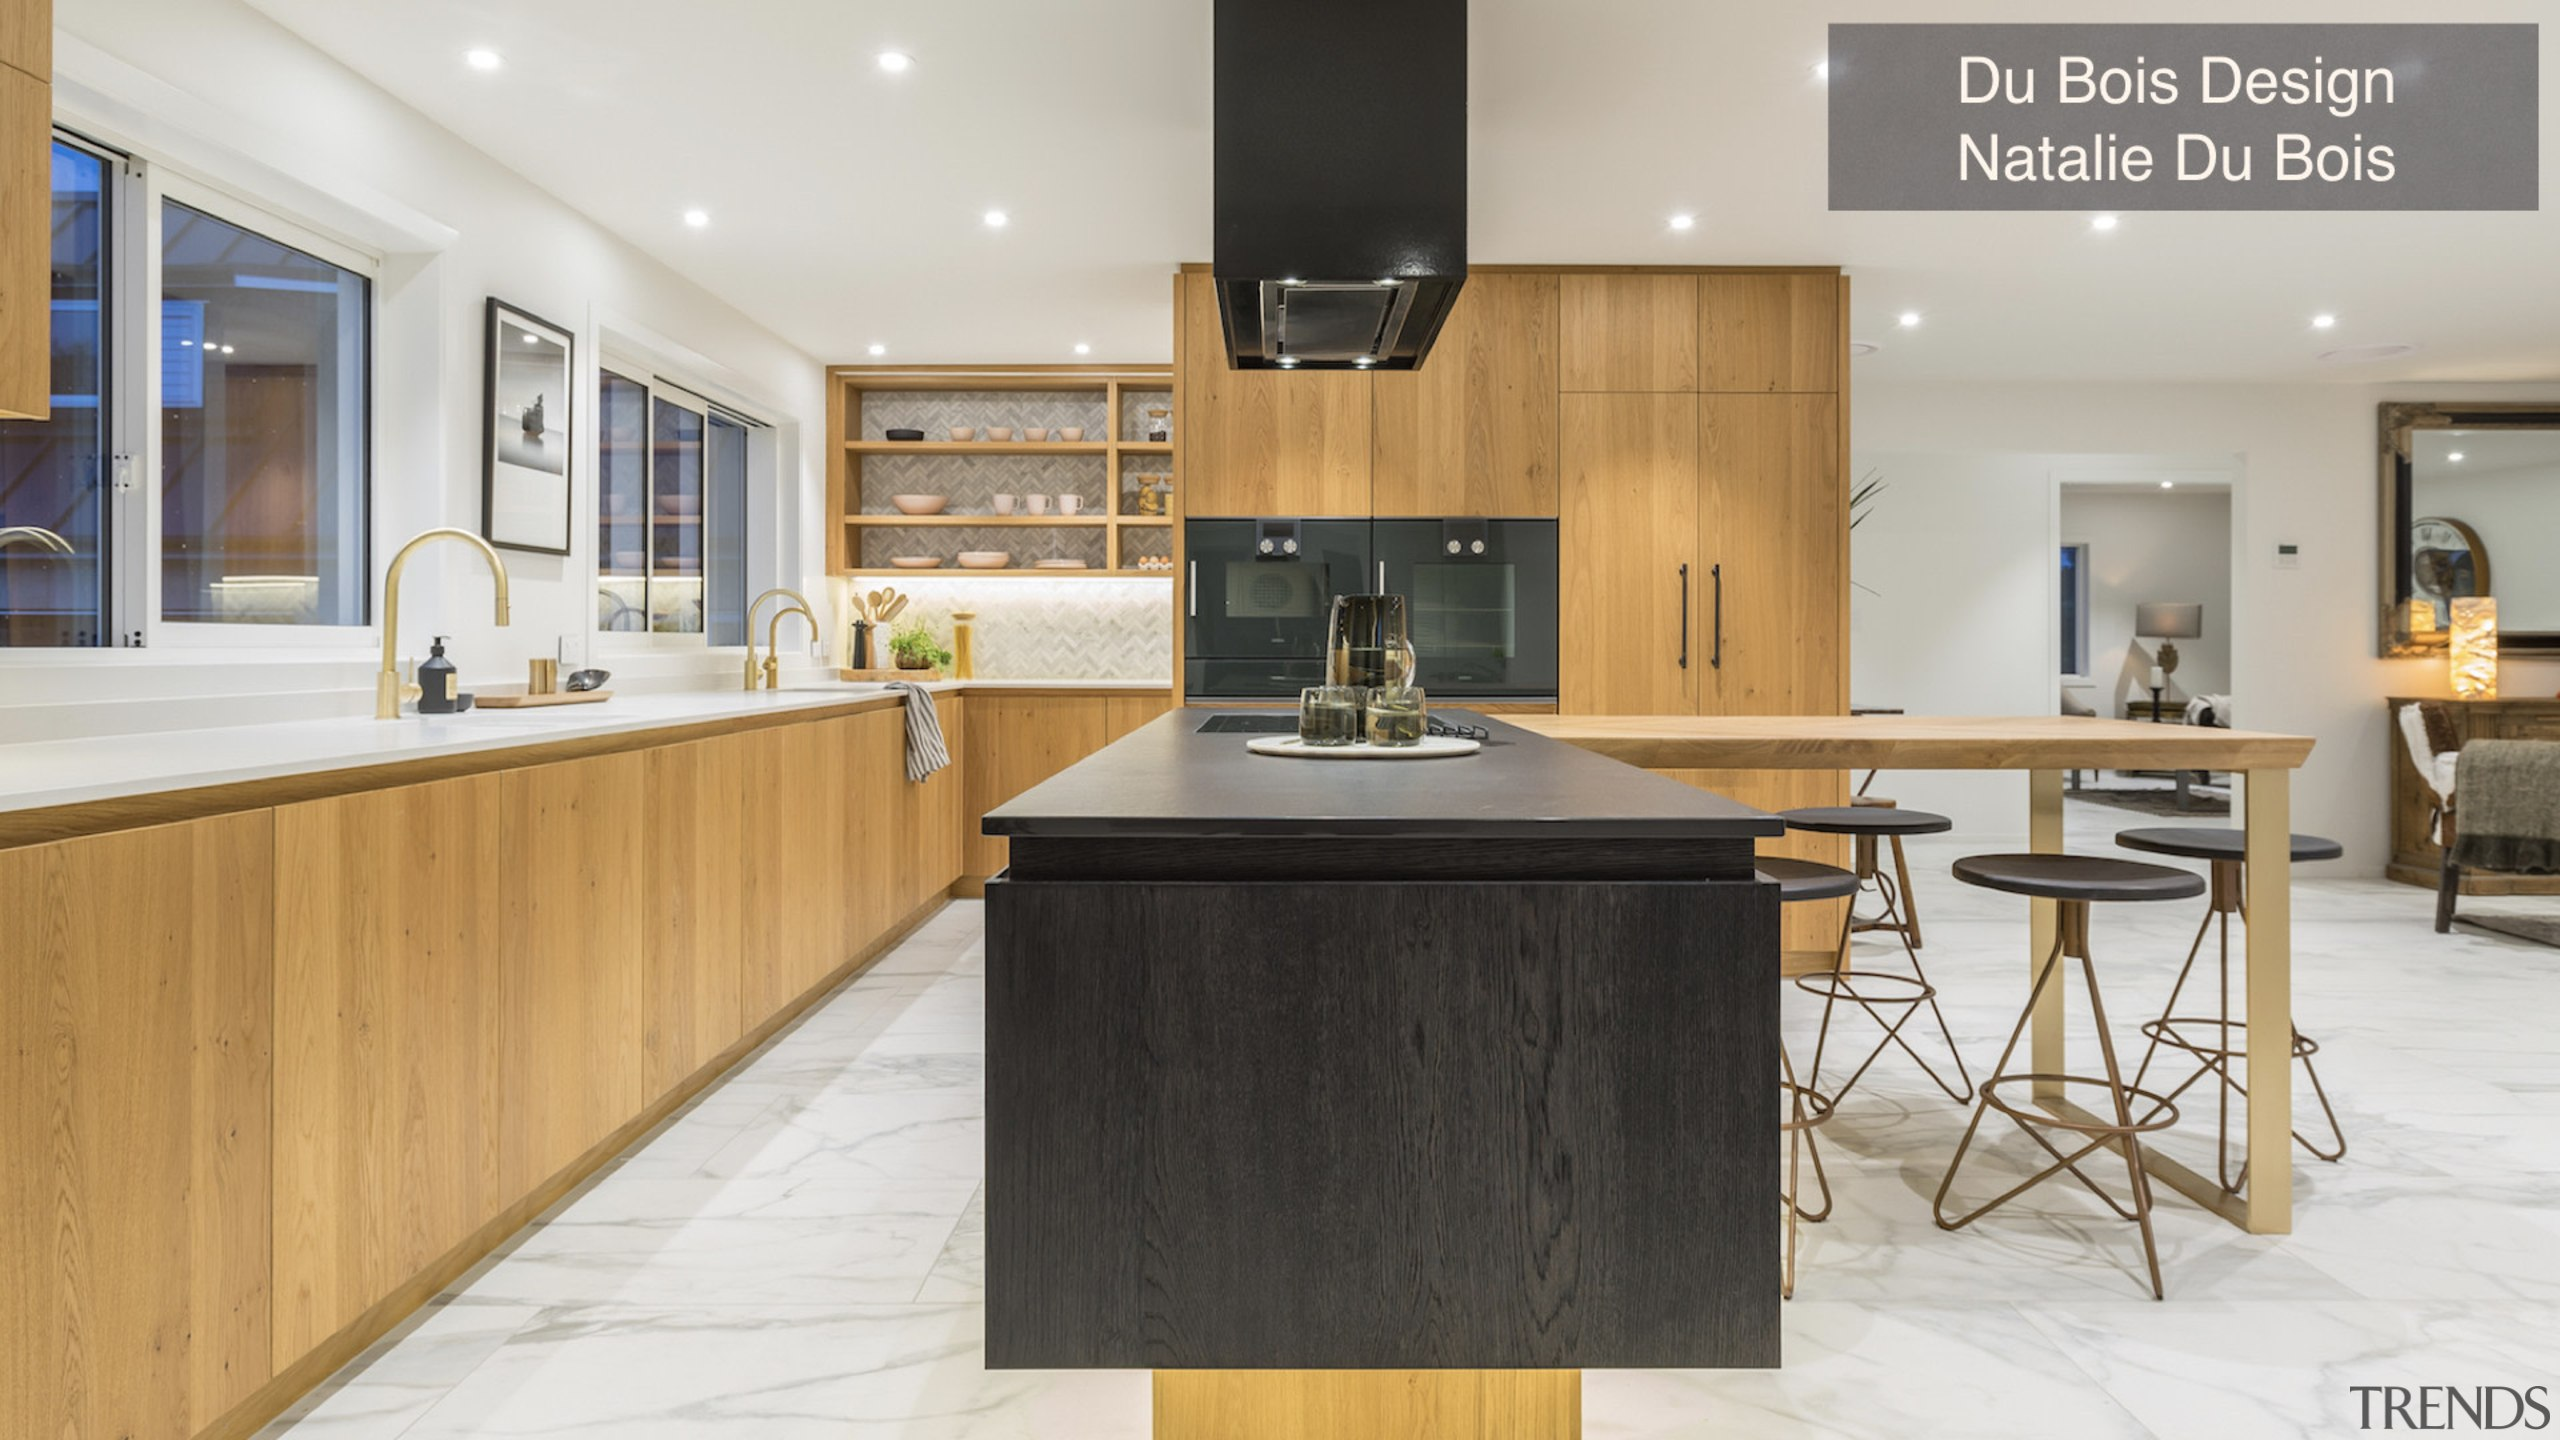 Highly Commended – Du Bois Design, Natalie Du countertop, cuisine classique, interior design, kitchen, real estate, white